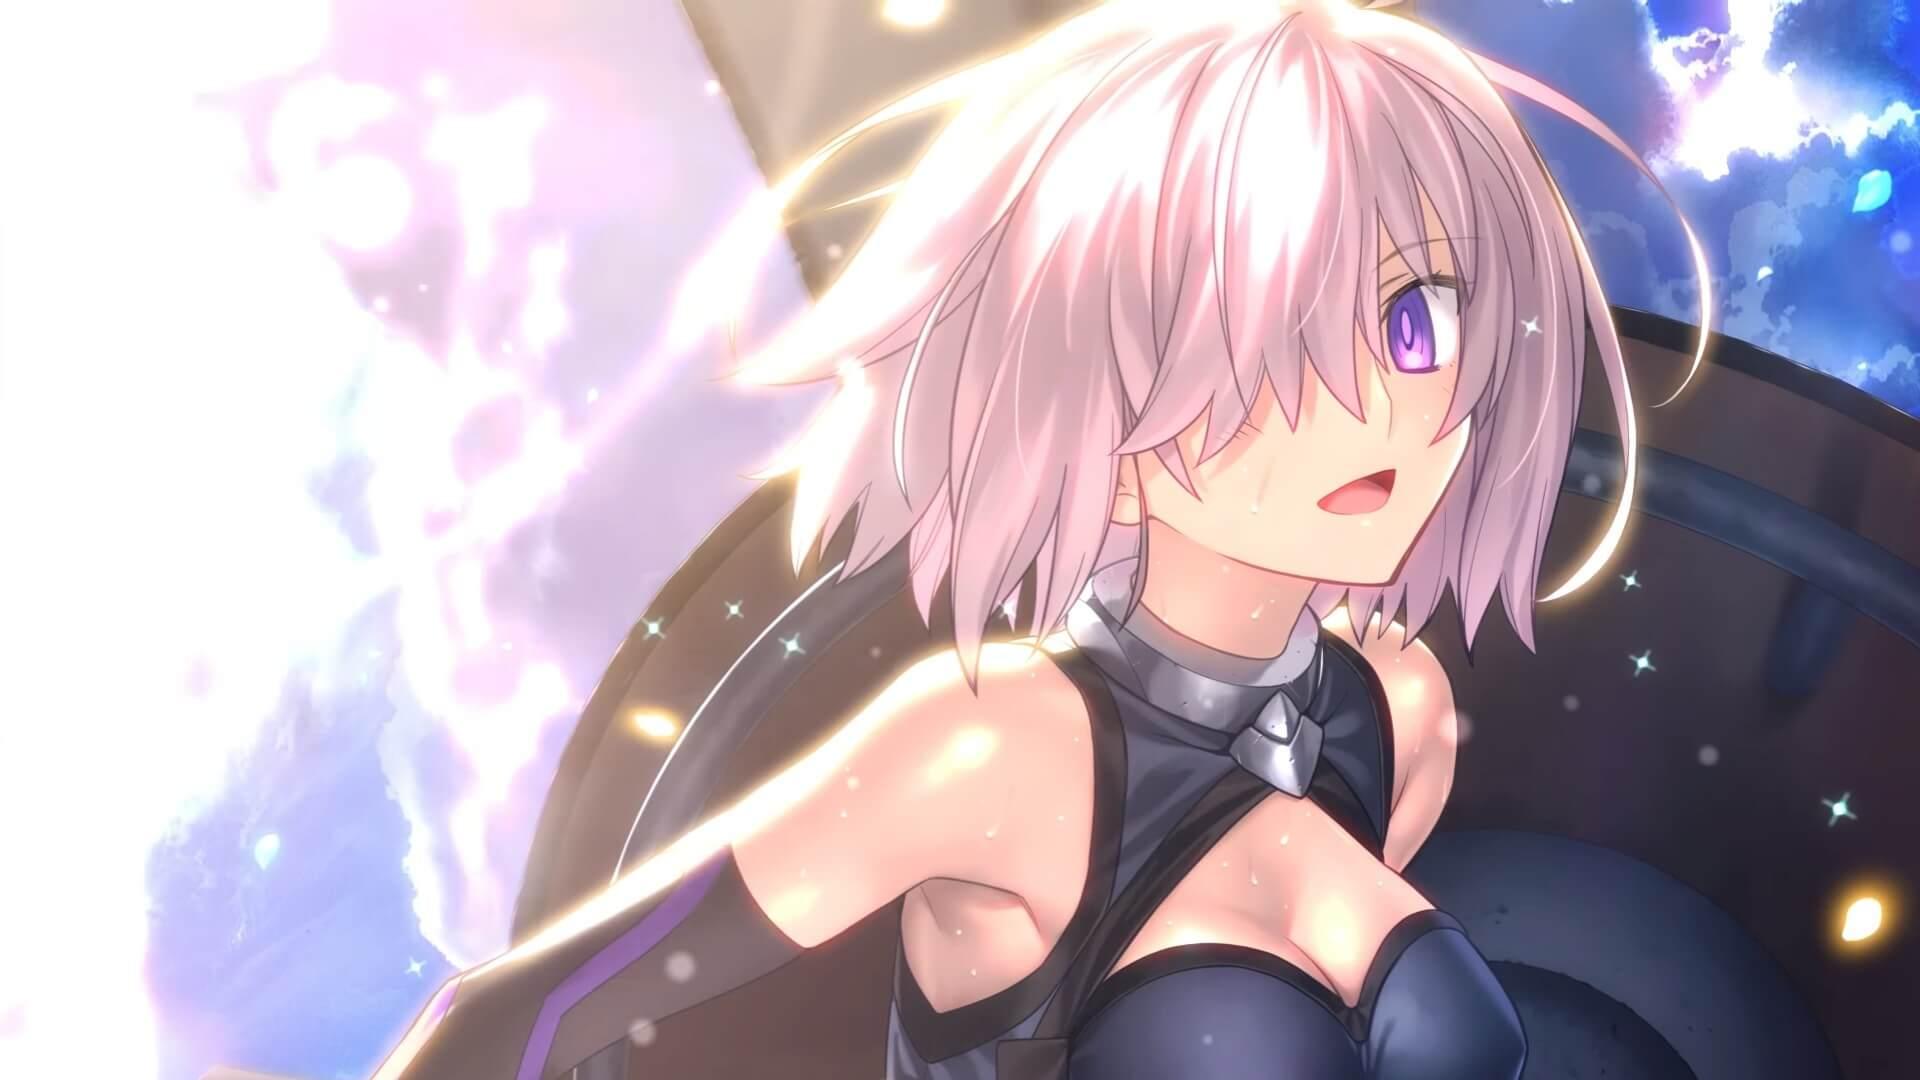 Wallpaper Anime Girls Fate Series Fate Grand Order Shielder